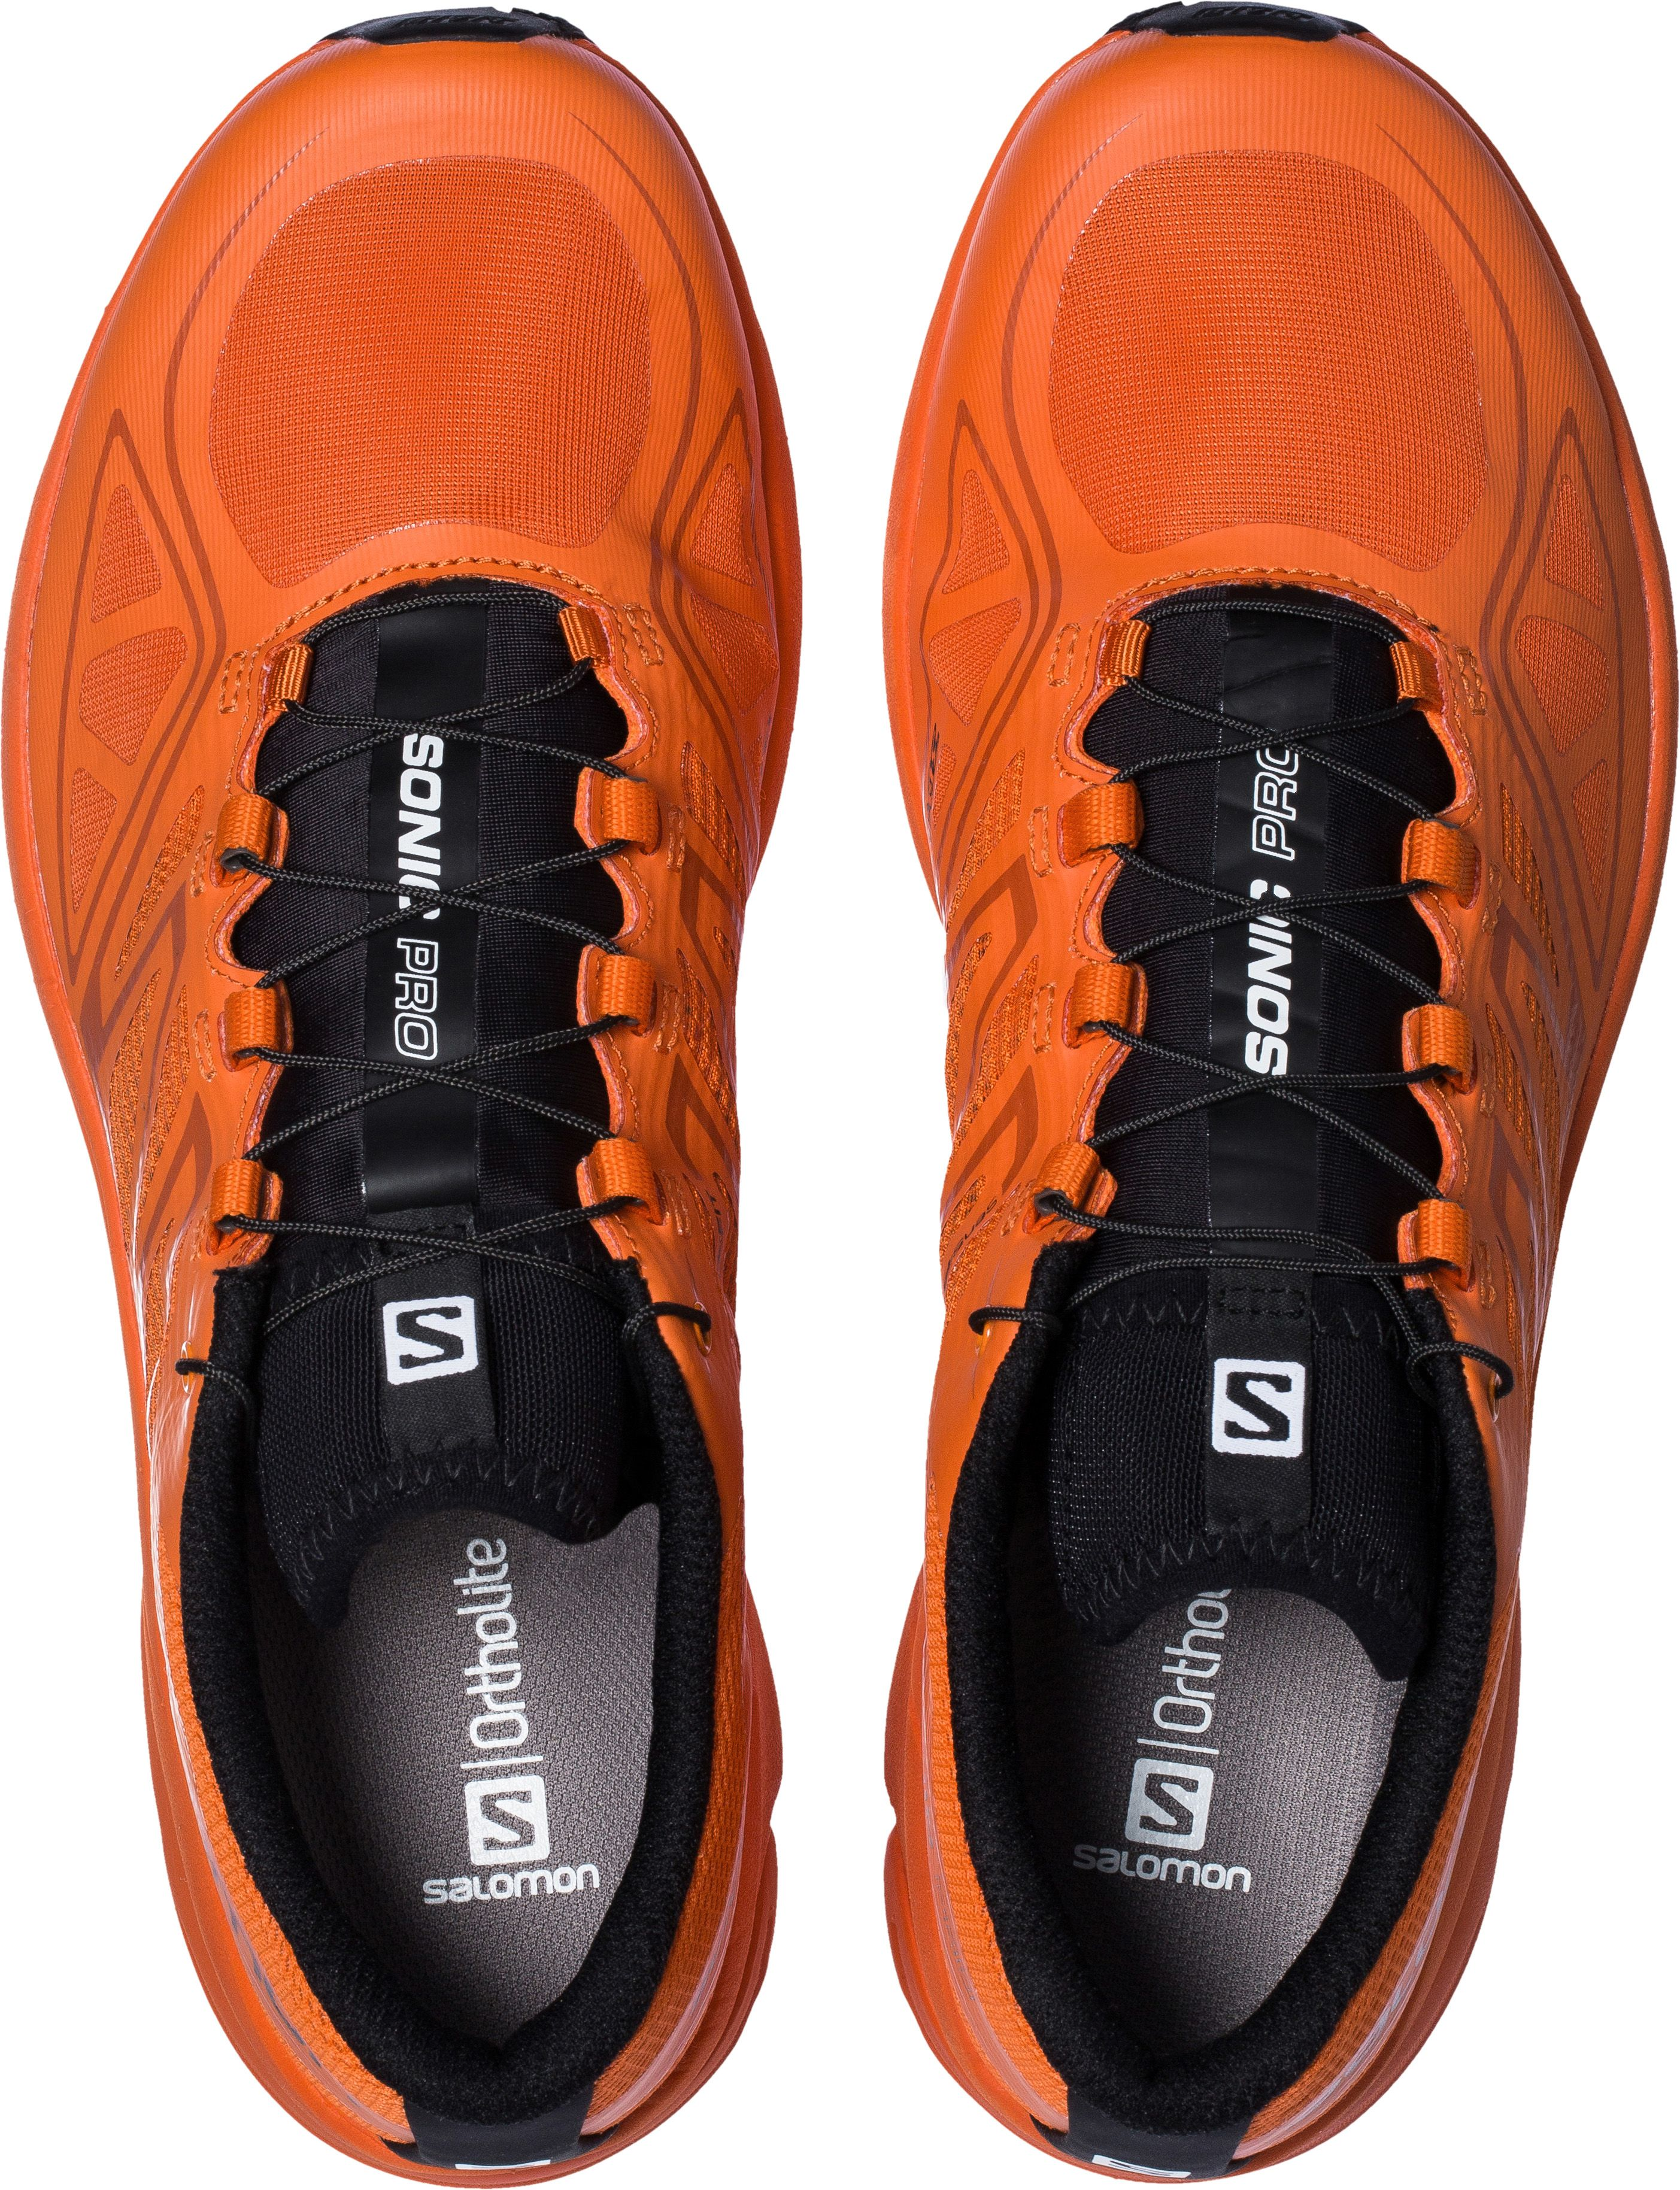 Buty Salomon Sonic Pro Tomato 379152 Obuwie Salomon Narty Fisher Atomic Head Buty Narciarskie Hoka Running Shoes Dc Sneaker Running Shoes